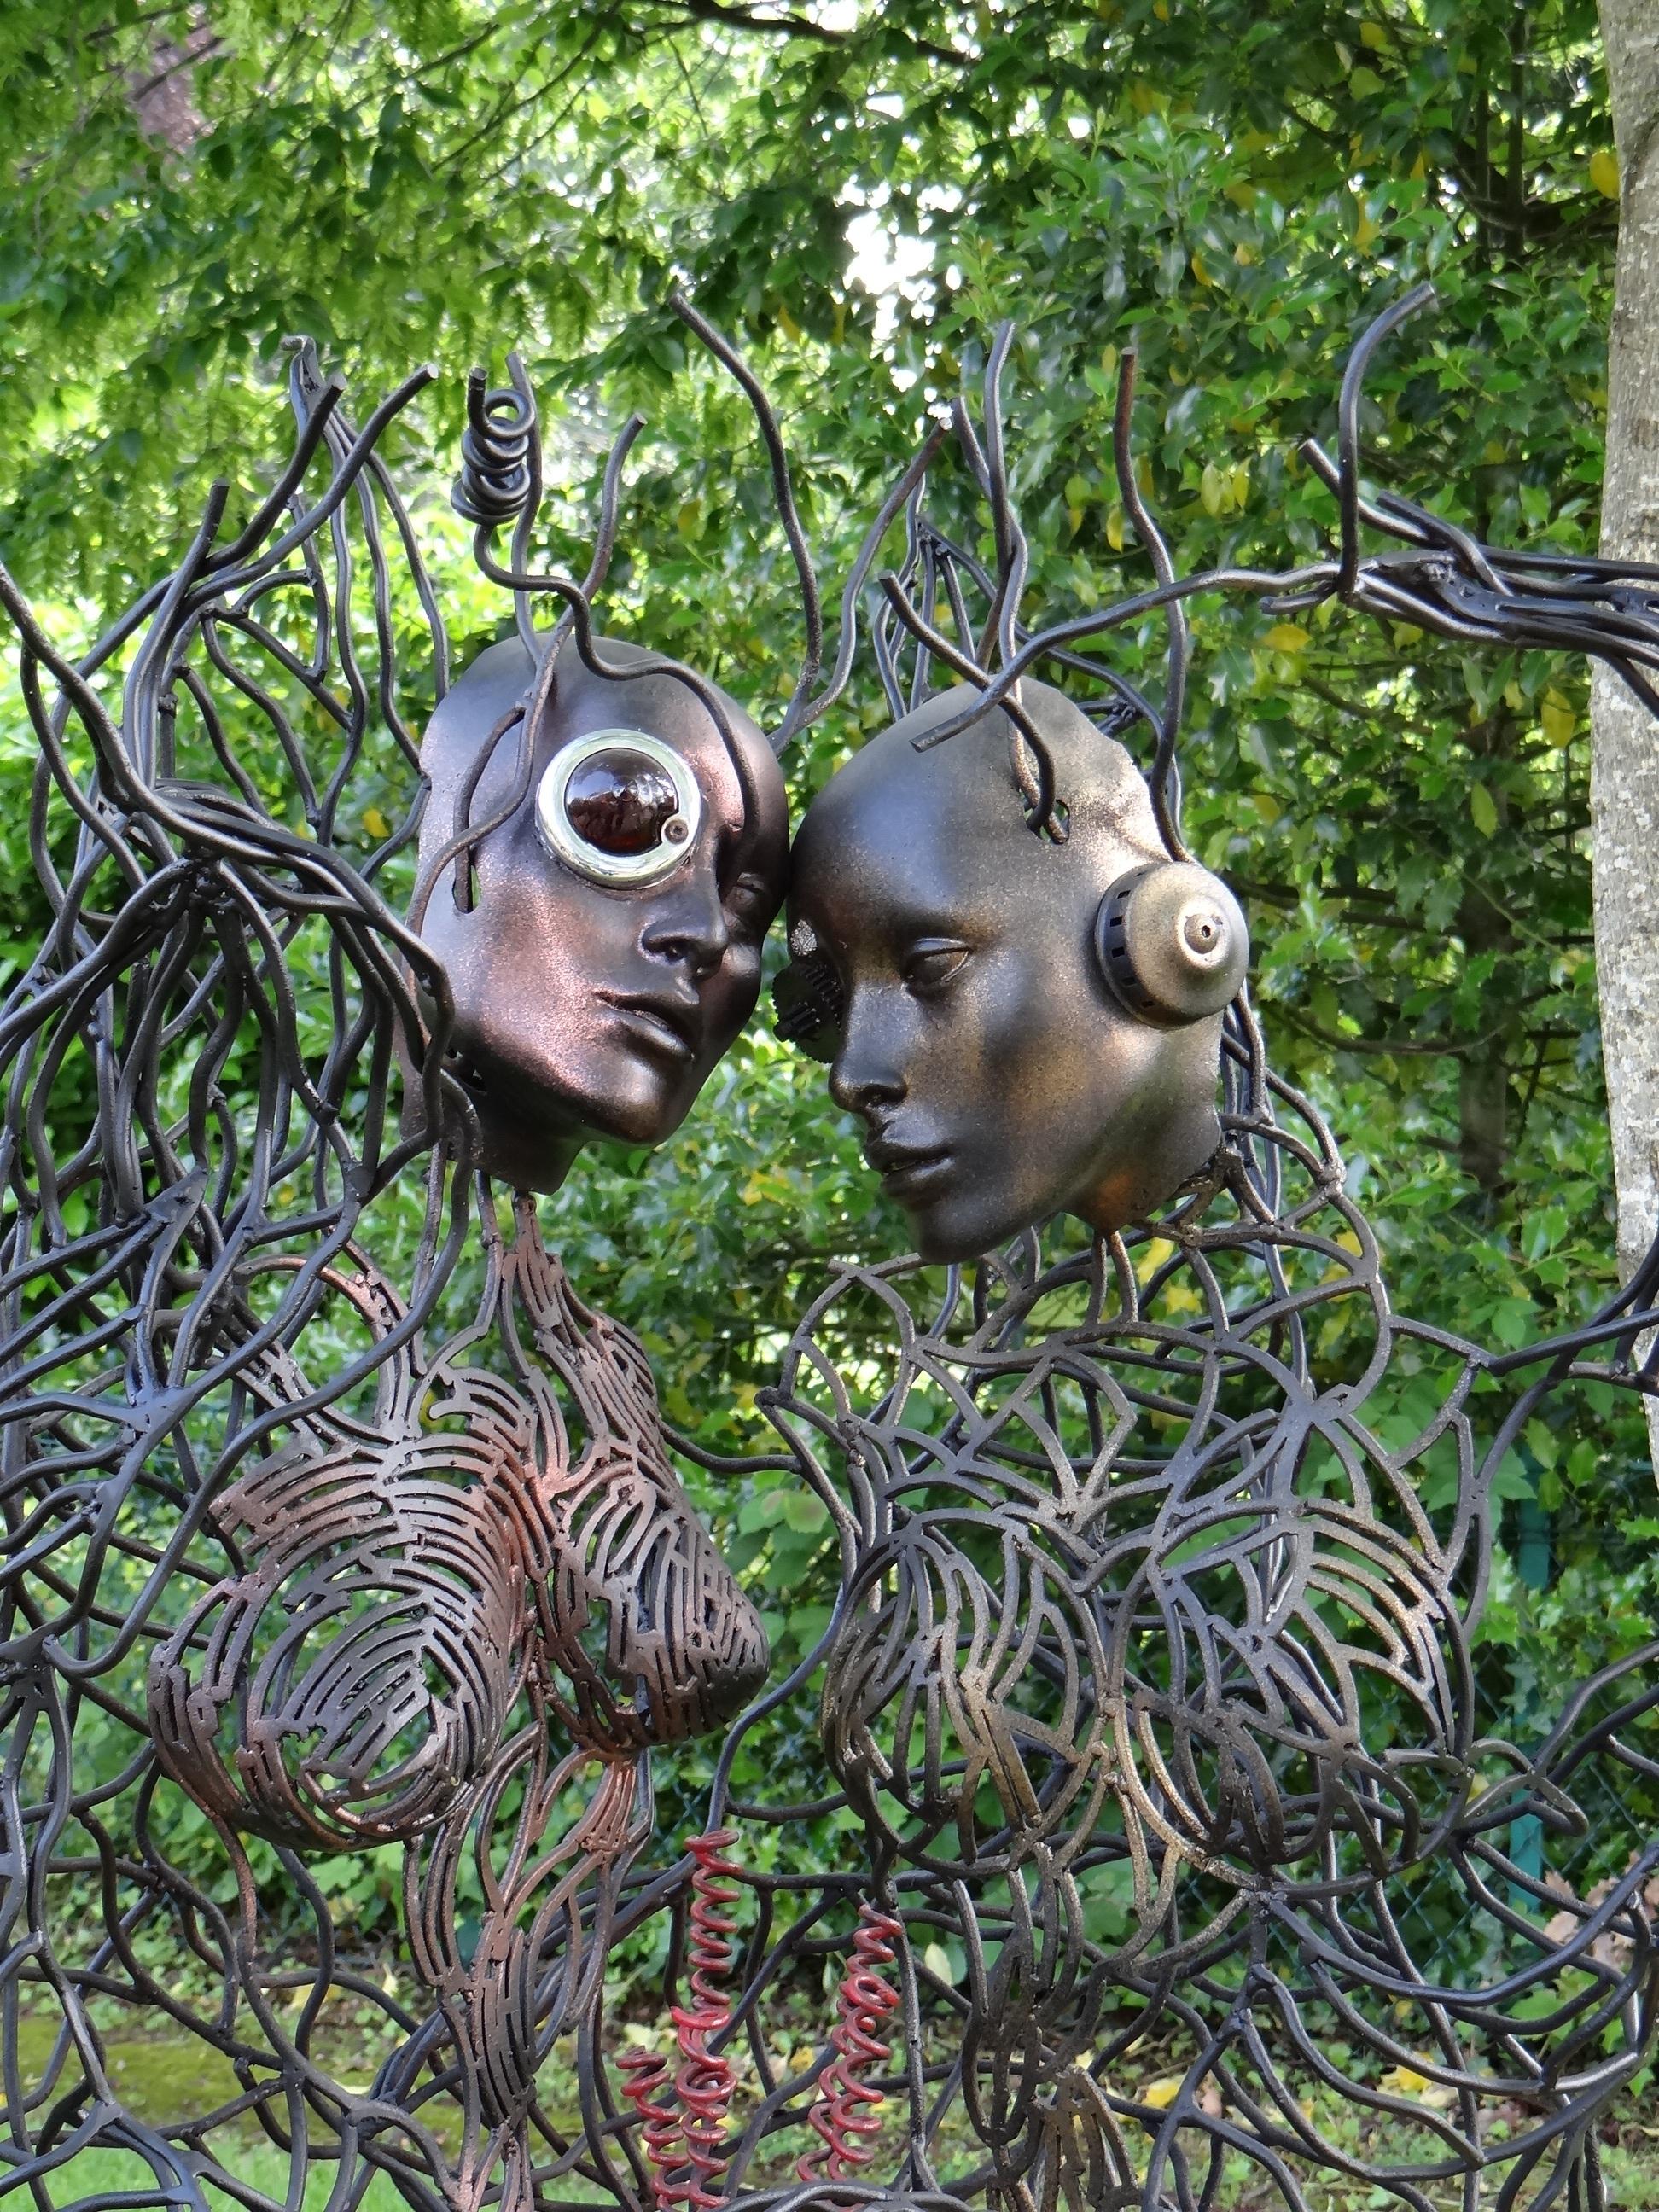 Tree Flower Meeting France Love Spring Jungle Park Metal Couple Romantic  Set Garden Artwork Sculpture Culture